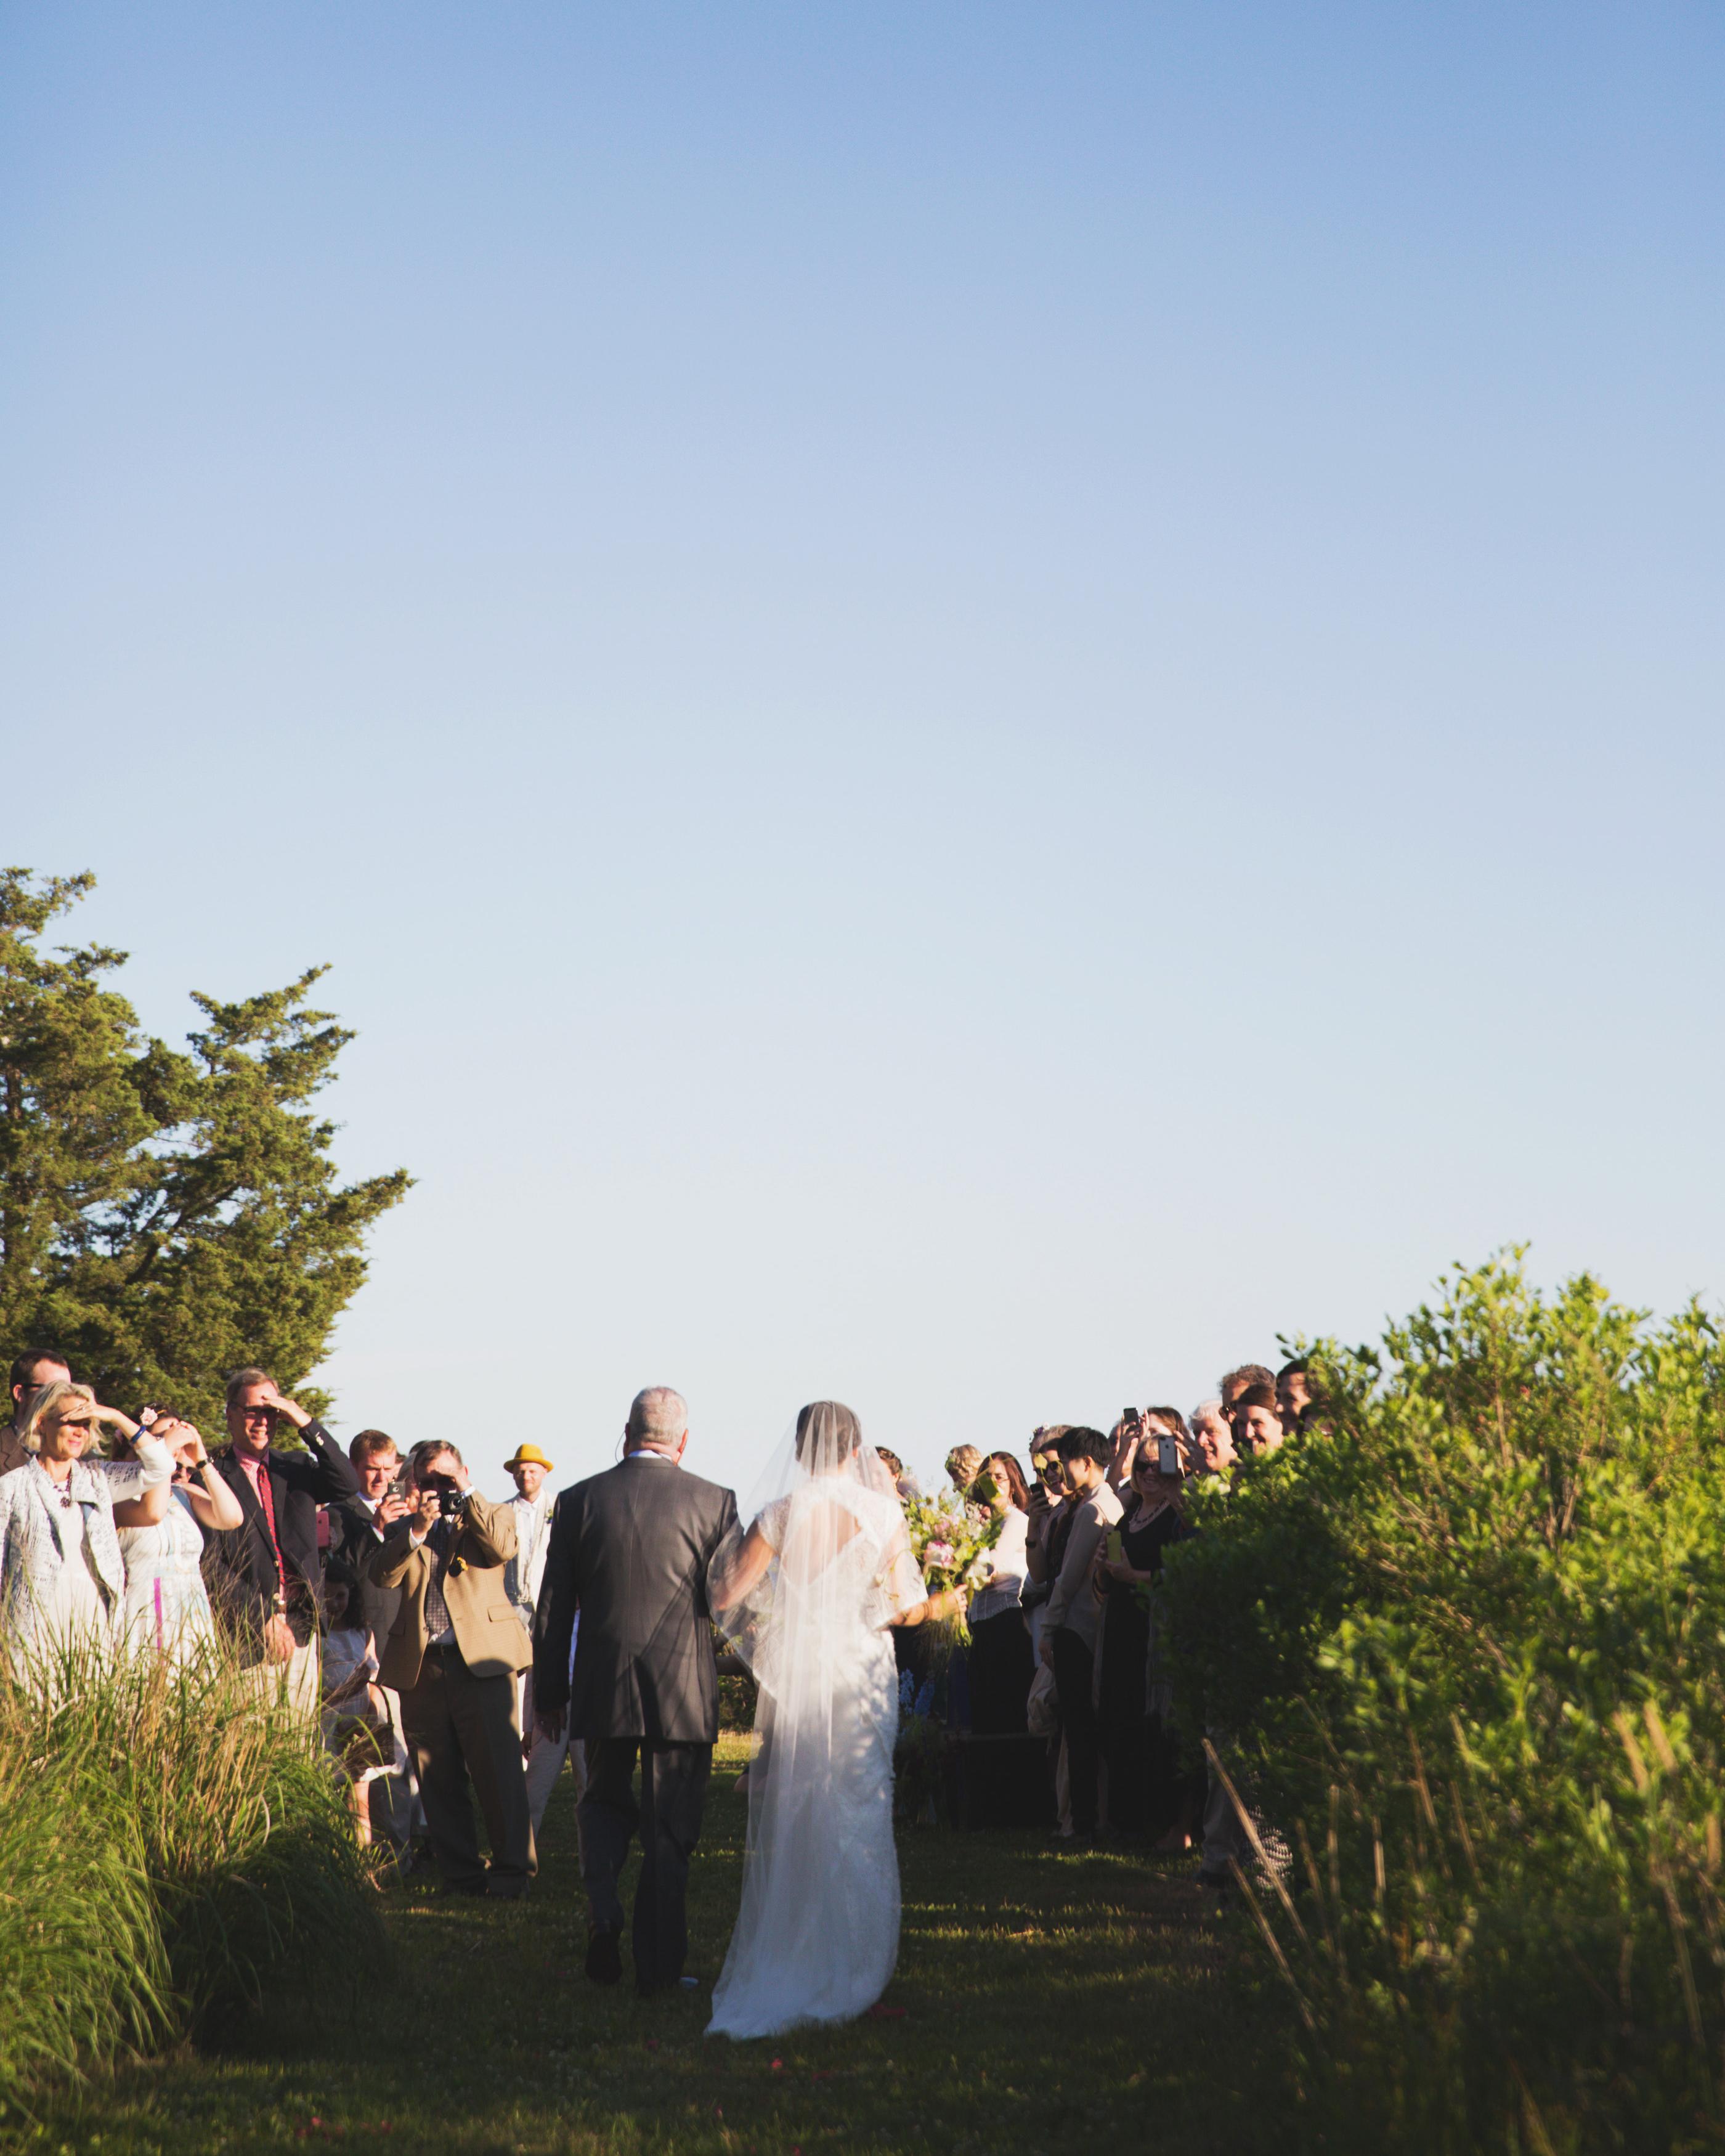 lilly-carter-wedding-ceremony-00355-s112037-0715..jpg